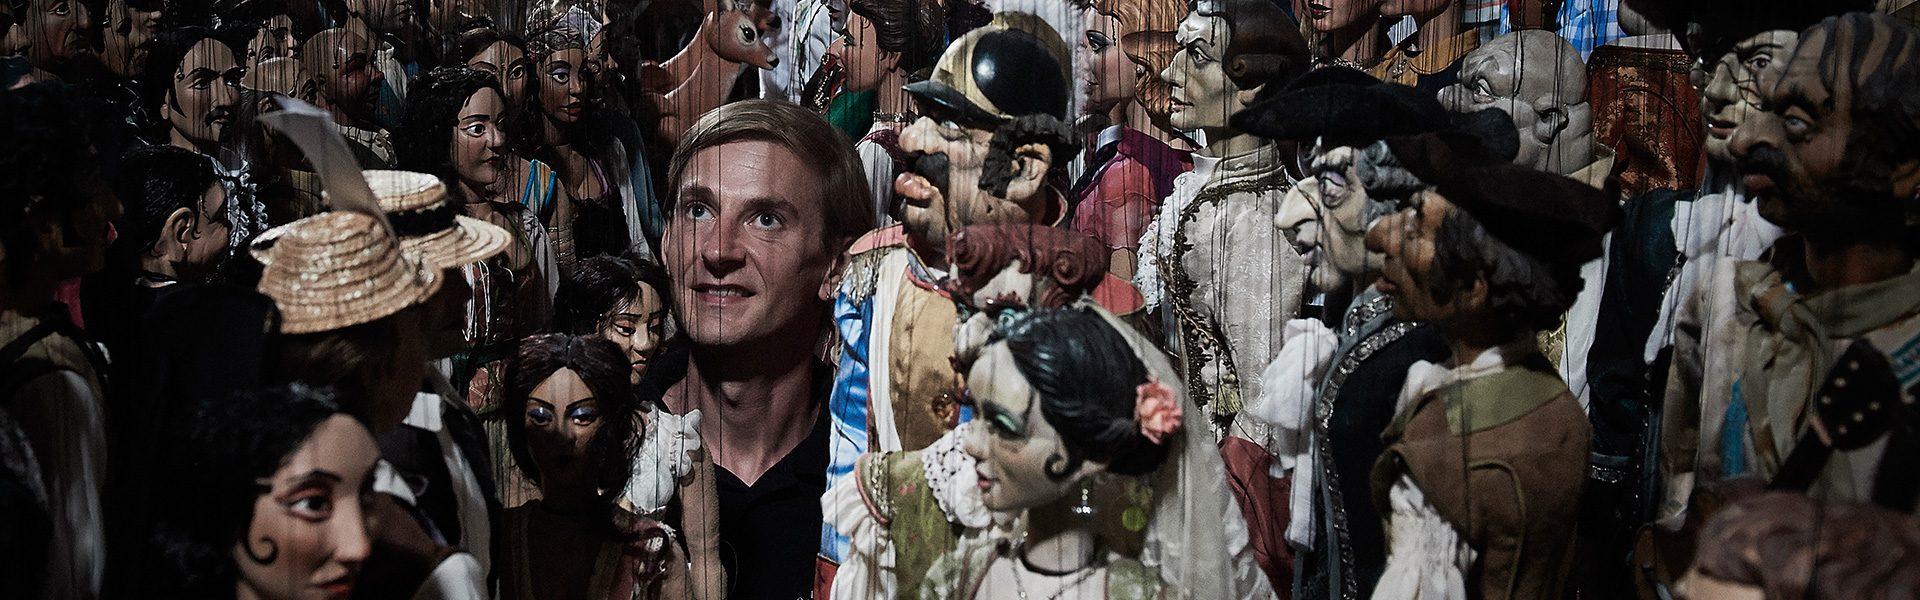 Marionetteoper | Foto: Hari Pulko